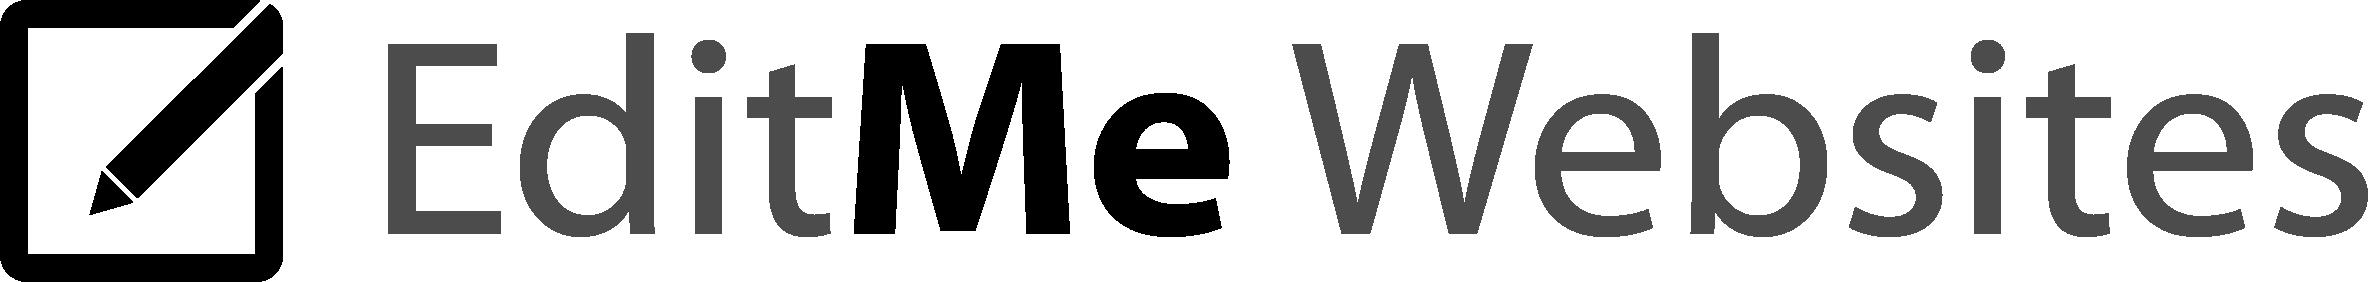 editme-logo-full